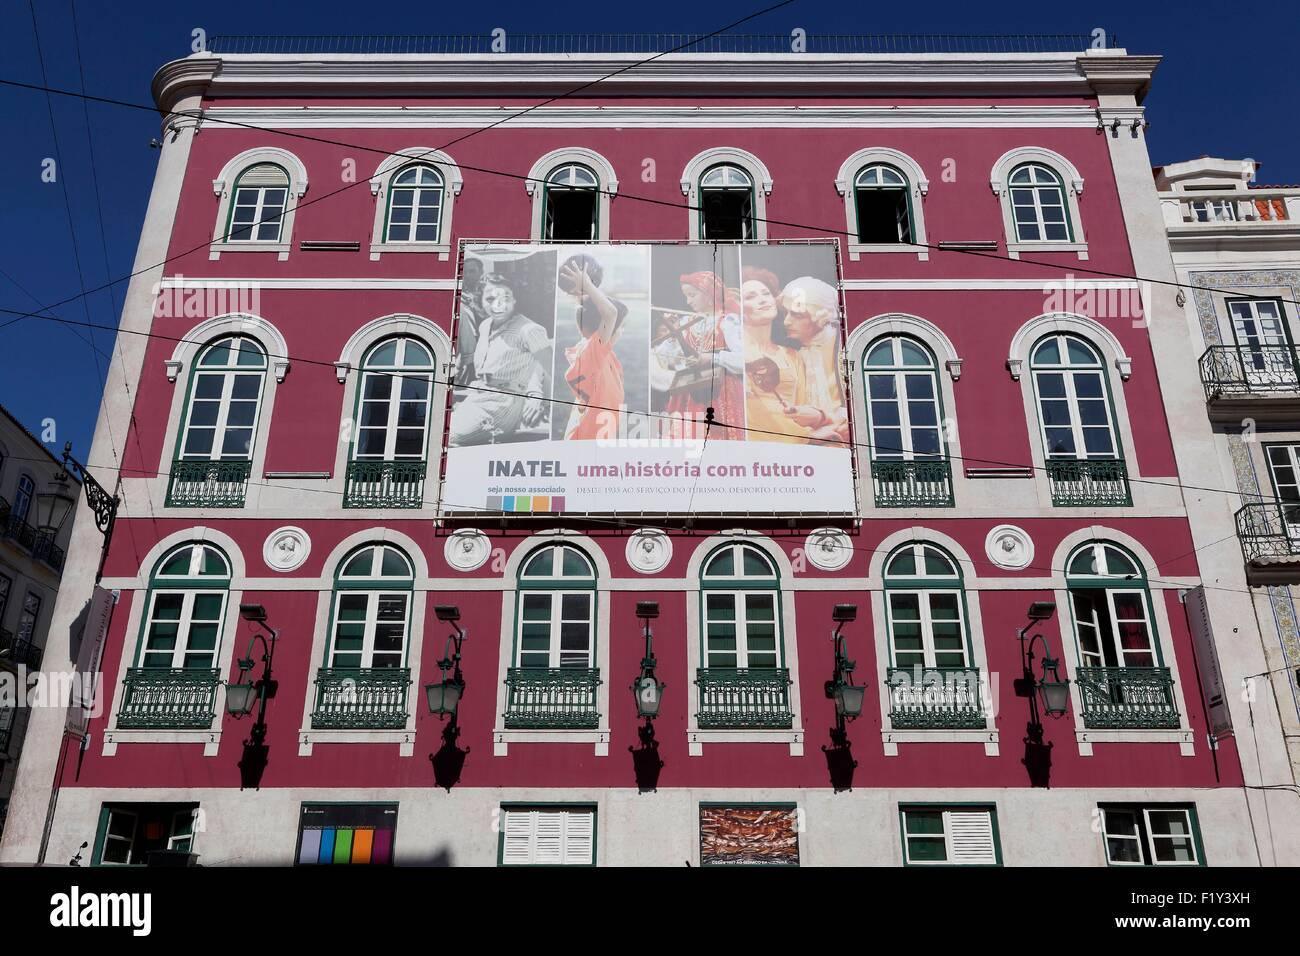 Portugal, Lissabon, Bairro Alto, Gebäude Fassade Stockbild